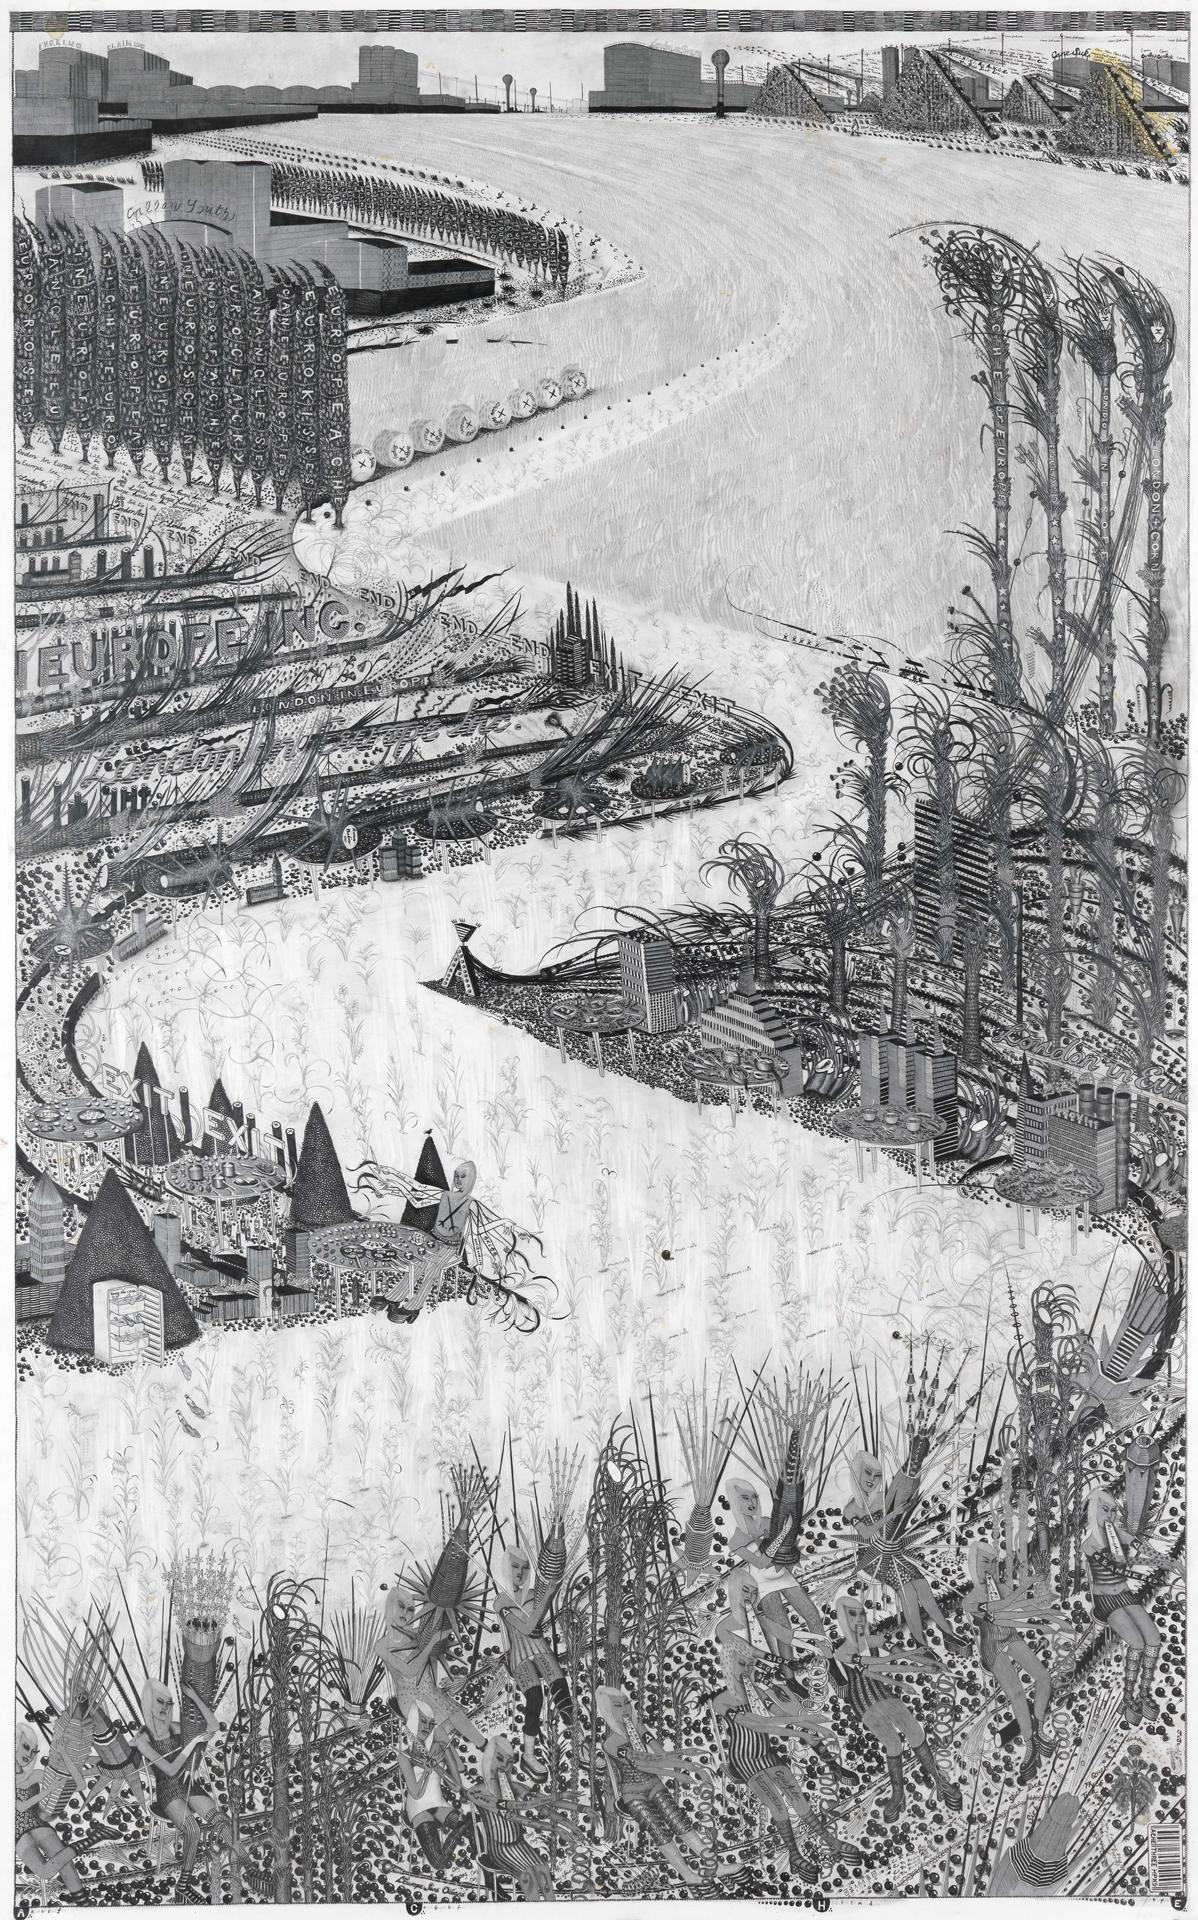 Hipkiss, A∴ C∴ H∴ E∴ 3, 2010, Mischtechnik auf Papier, 192 x 112 cm